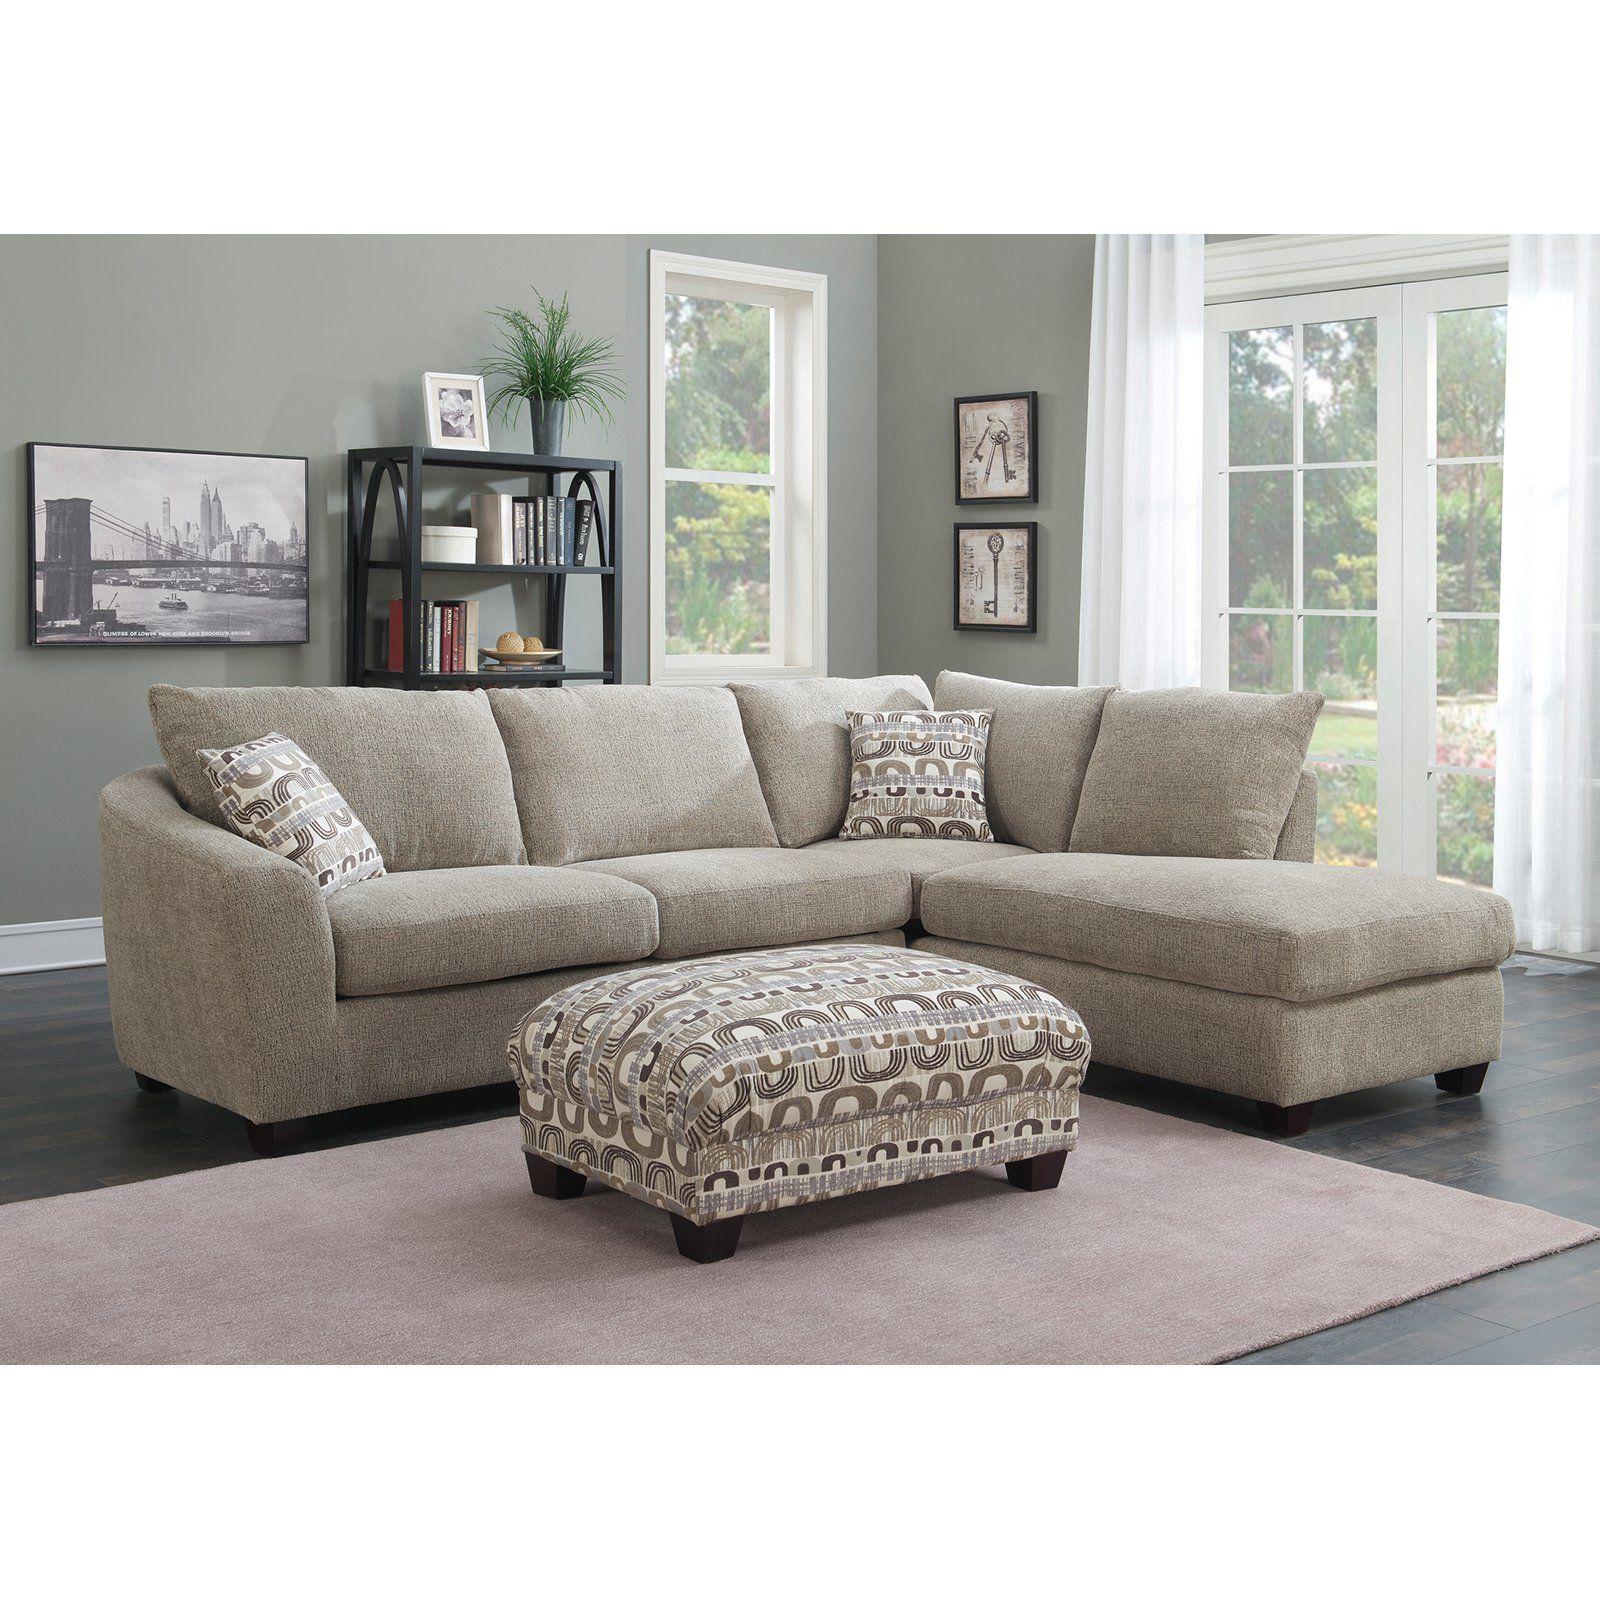 Emerald Home Urbana 2 Piece Sectional Sofa with Chaise Bone ...